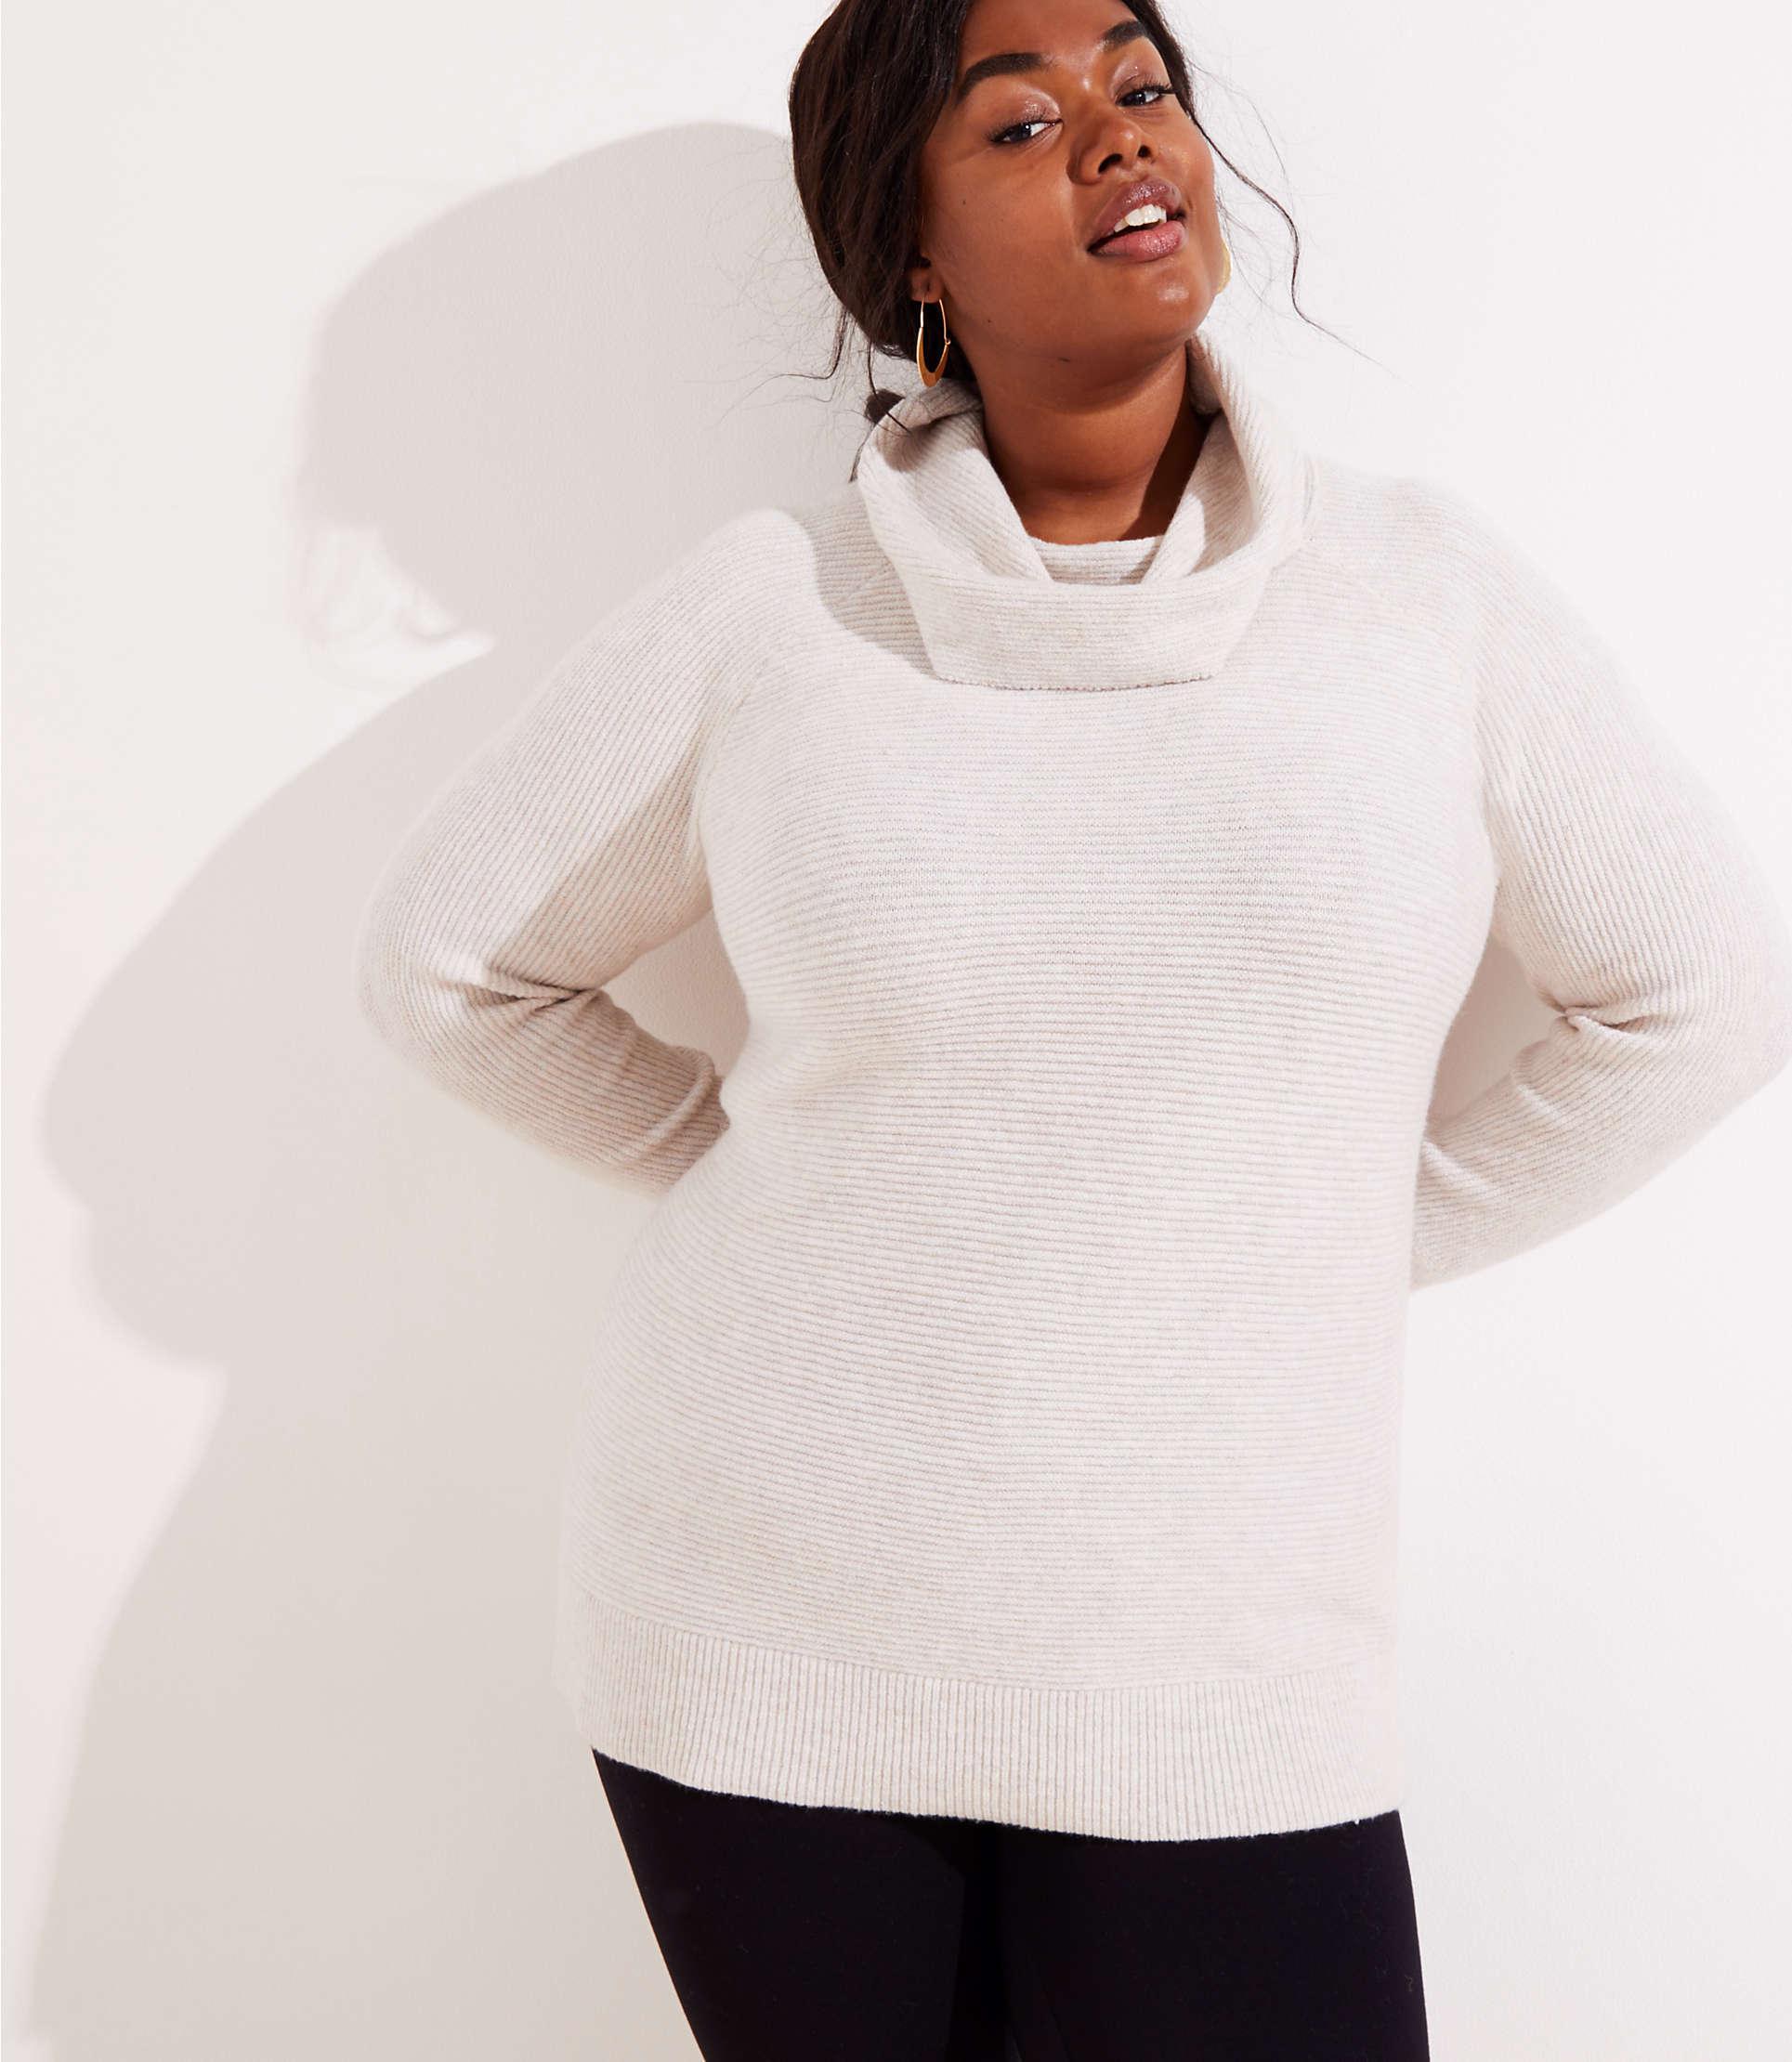 ef8928c4ee4 Lyst - LOFT Plus Cowl Neck Tunic Sweater